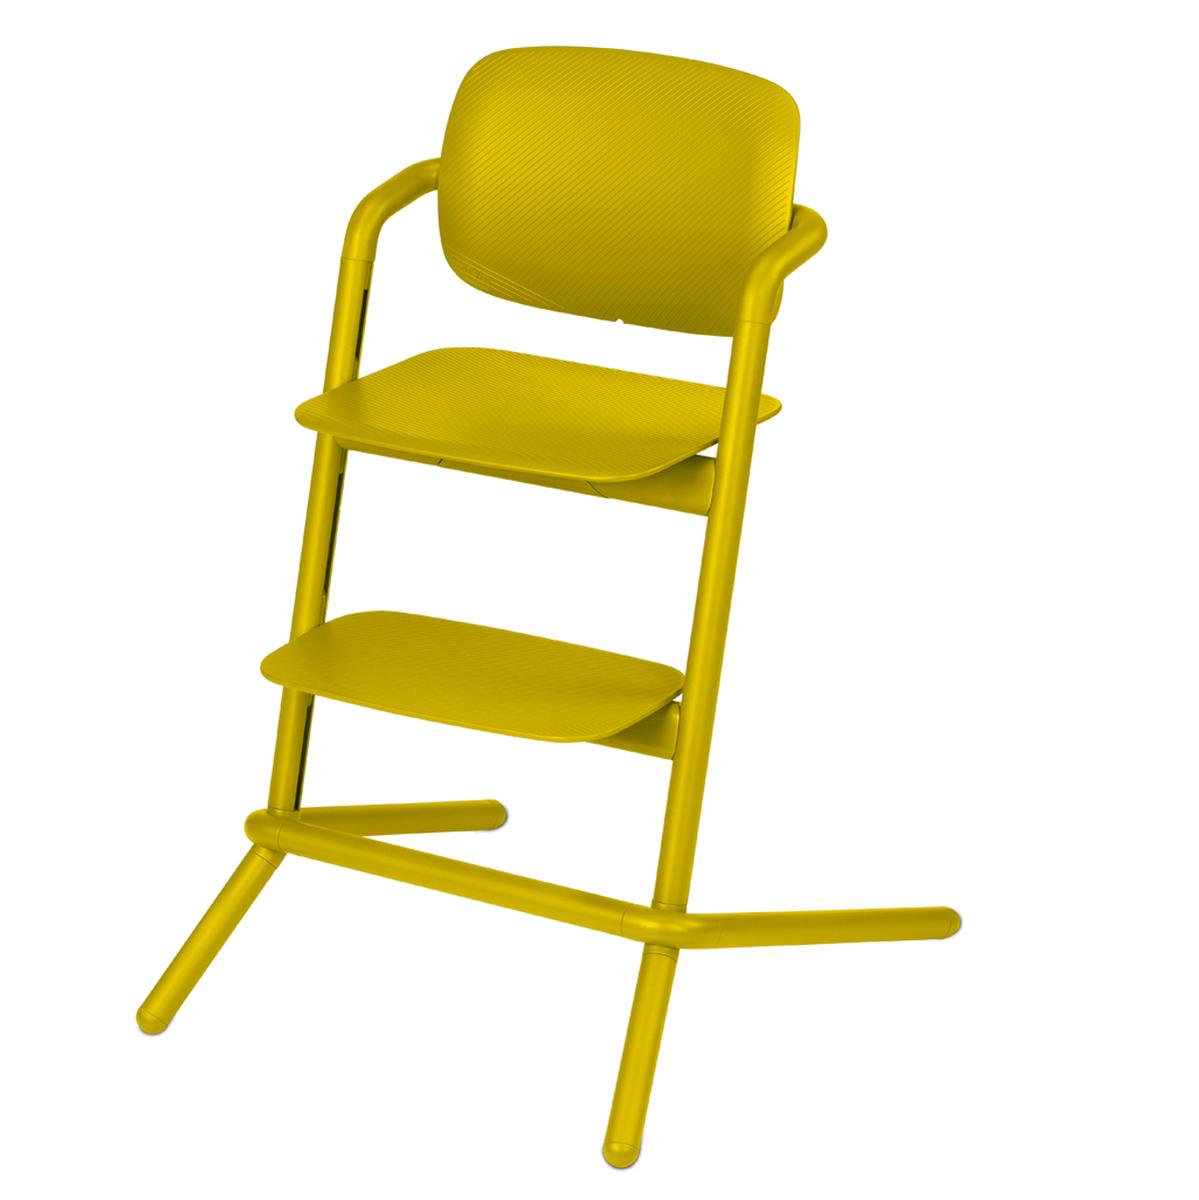 Chaise haute Chaise Haute Lemo - Canary Yellow Chaise Haute Lemo - Canary Yellow